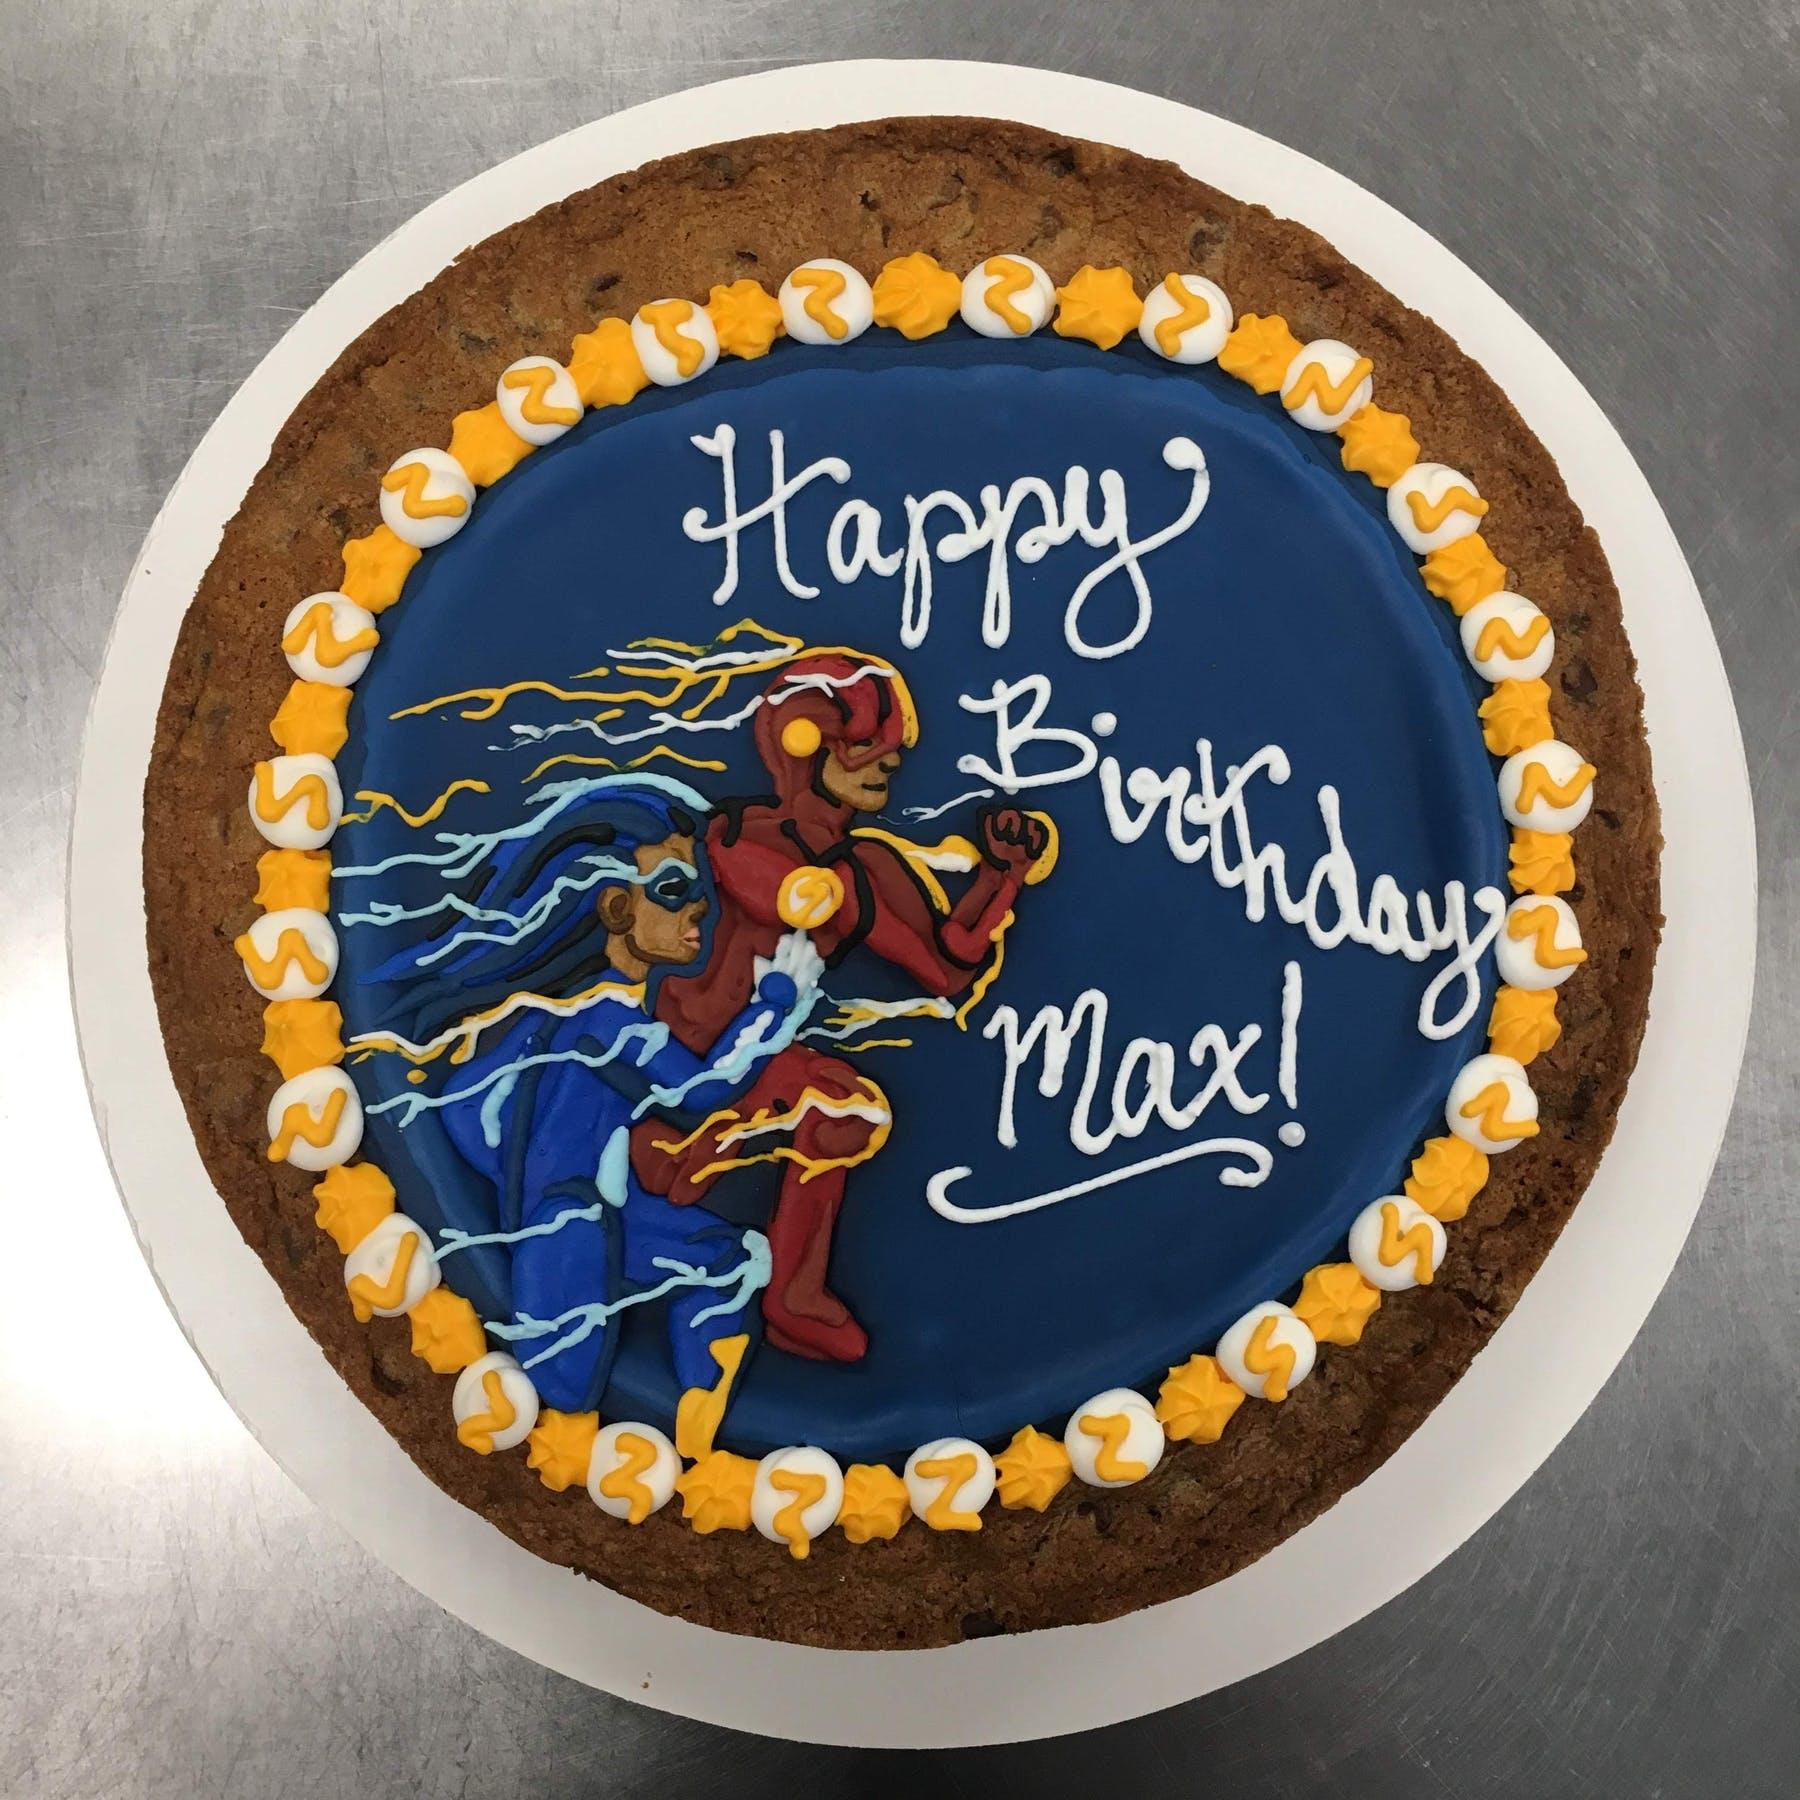 HB Max cake